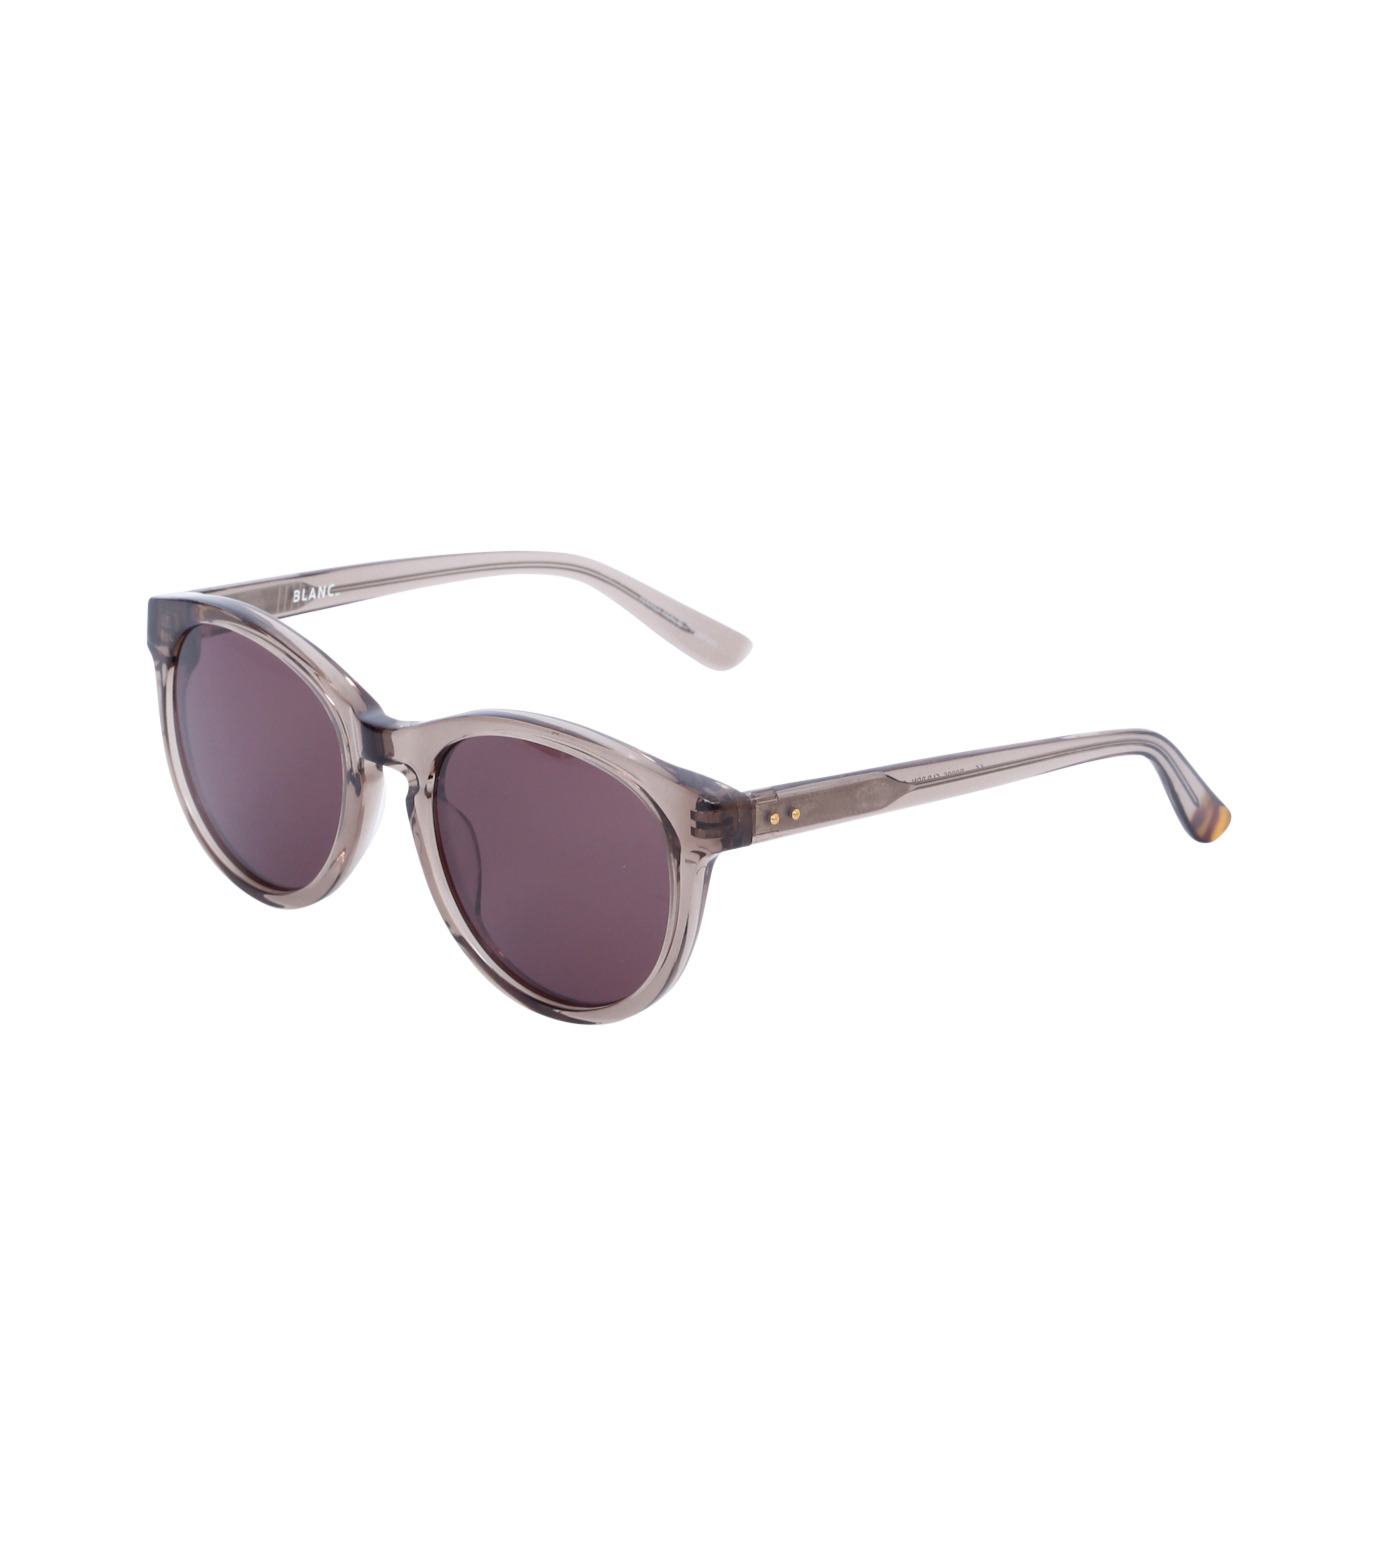 BLANC(ブラン)のOval Frame Sunglass-SILVER(アイウェア/eyewear)-B0005-1 拡大詳細画像1